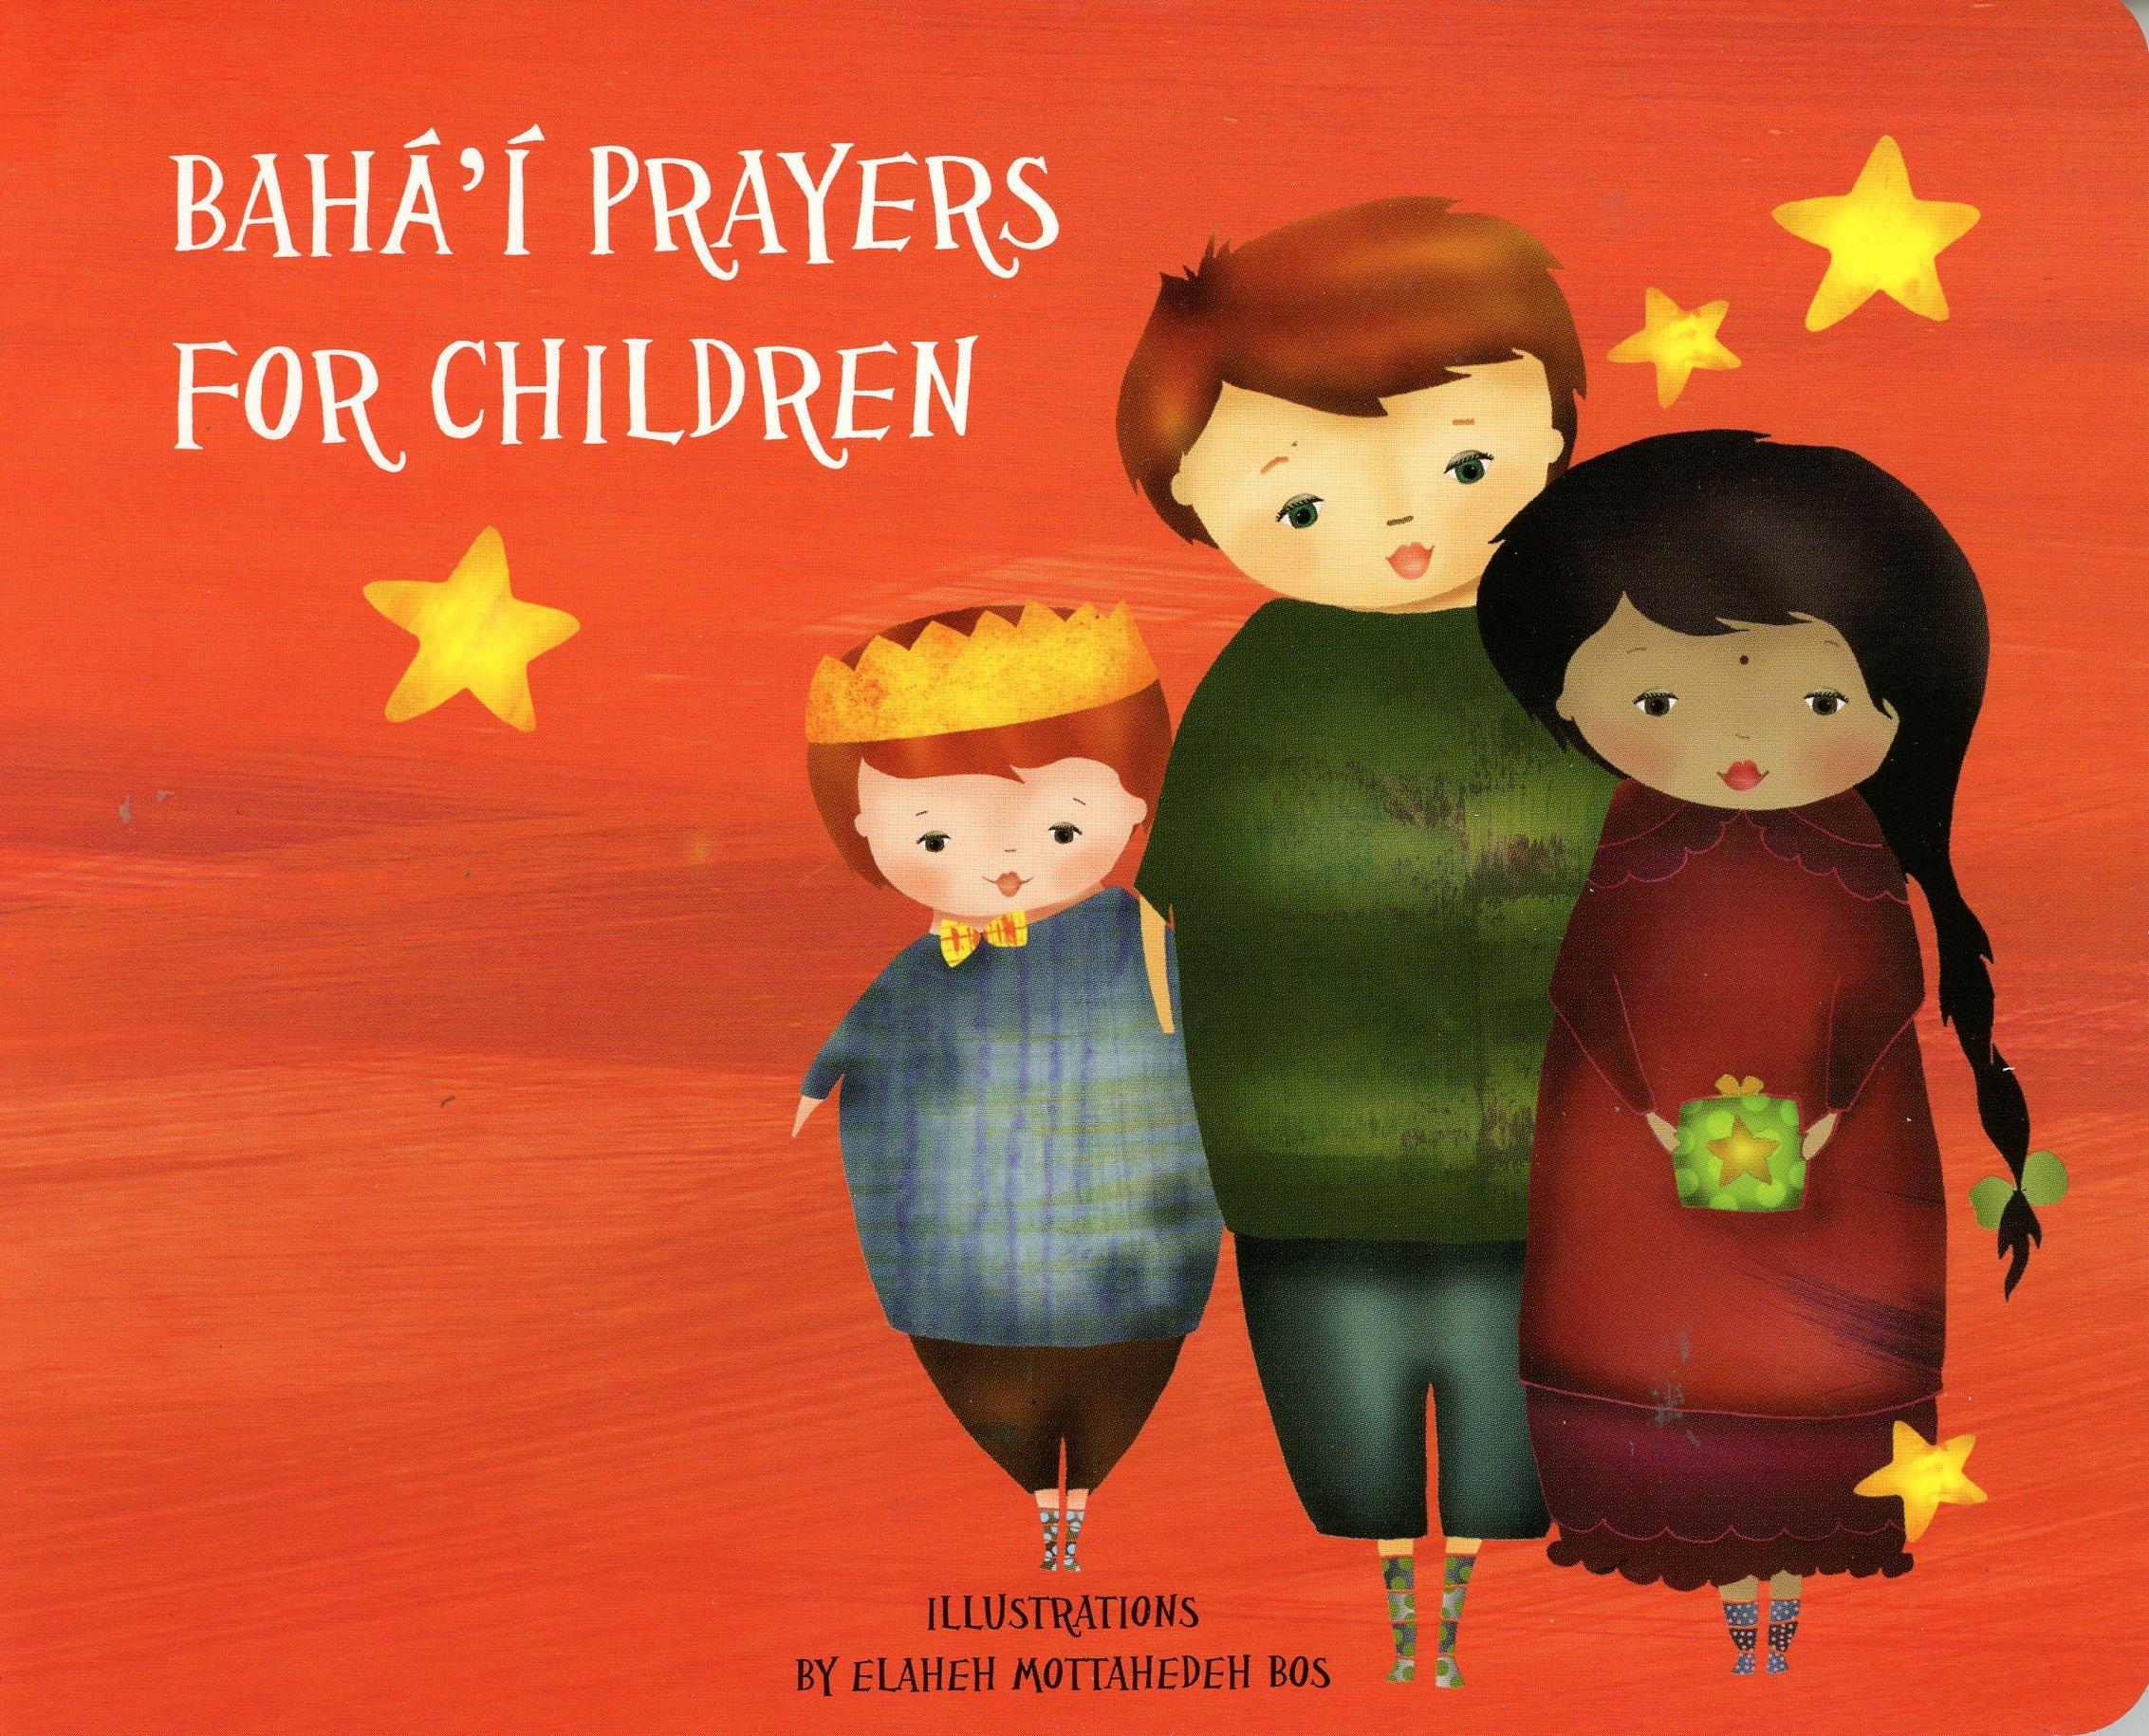 Bahai Prayers for Children Orange Board Book